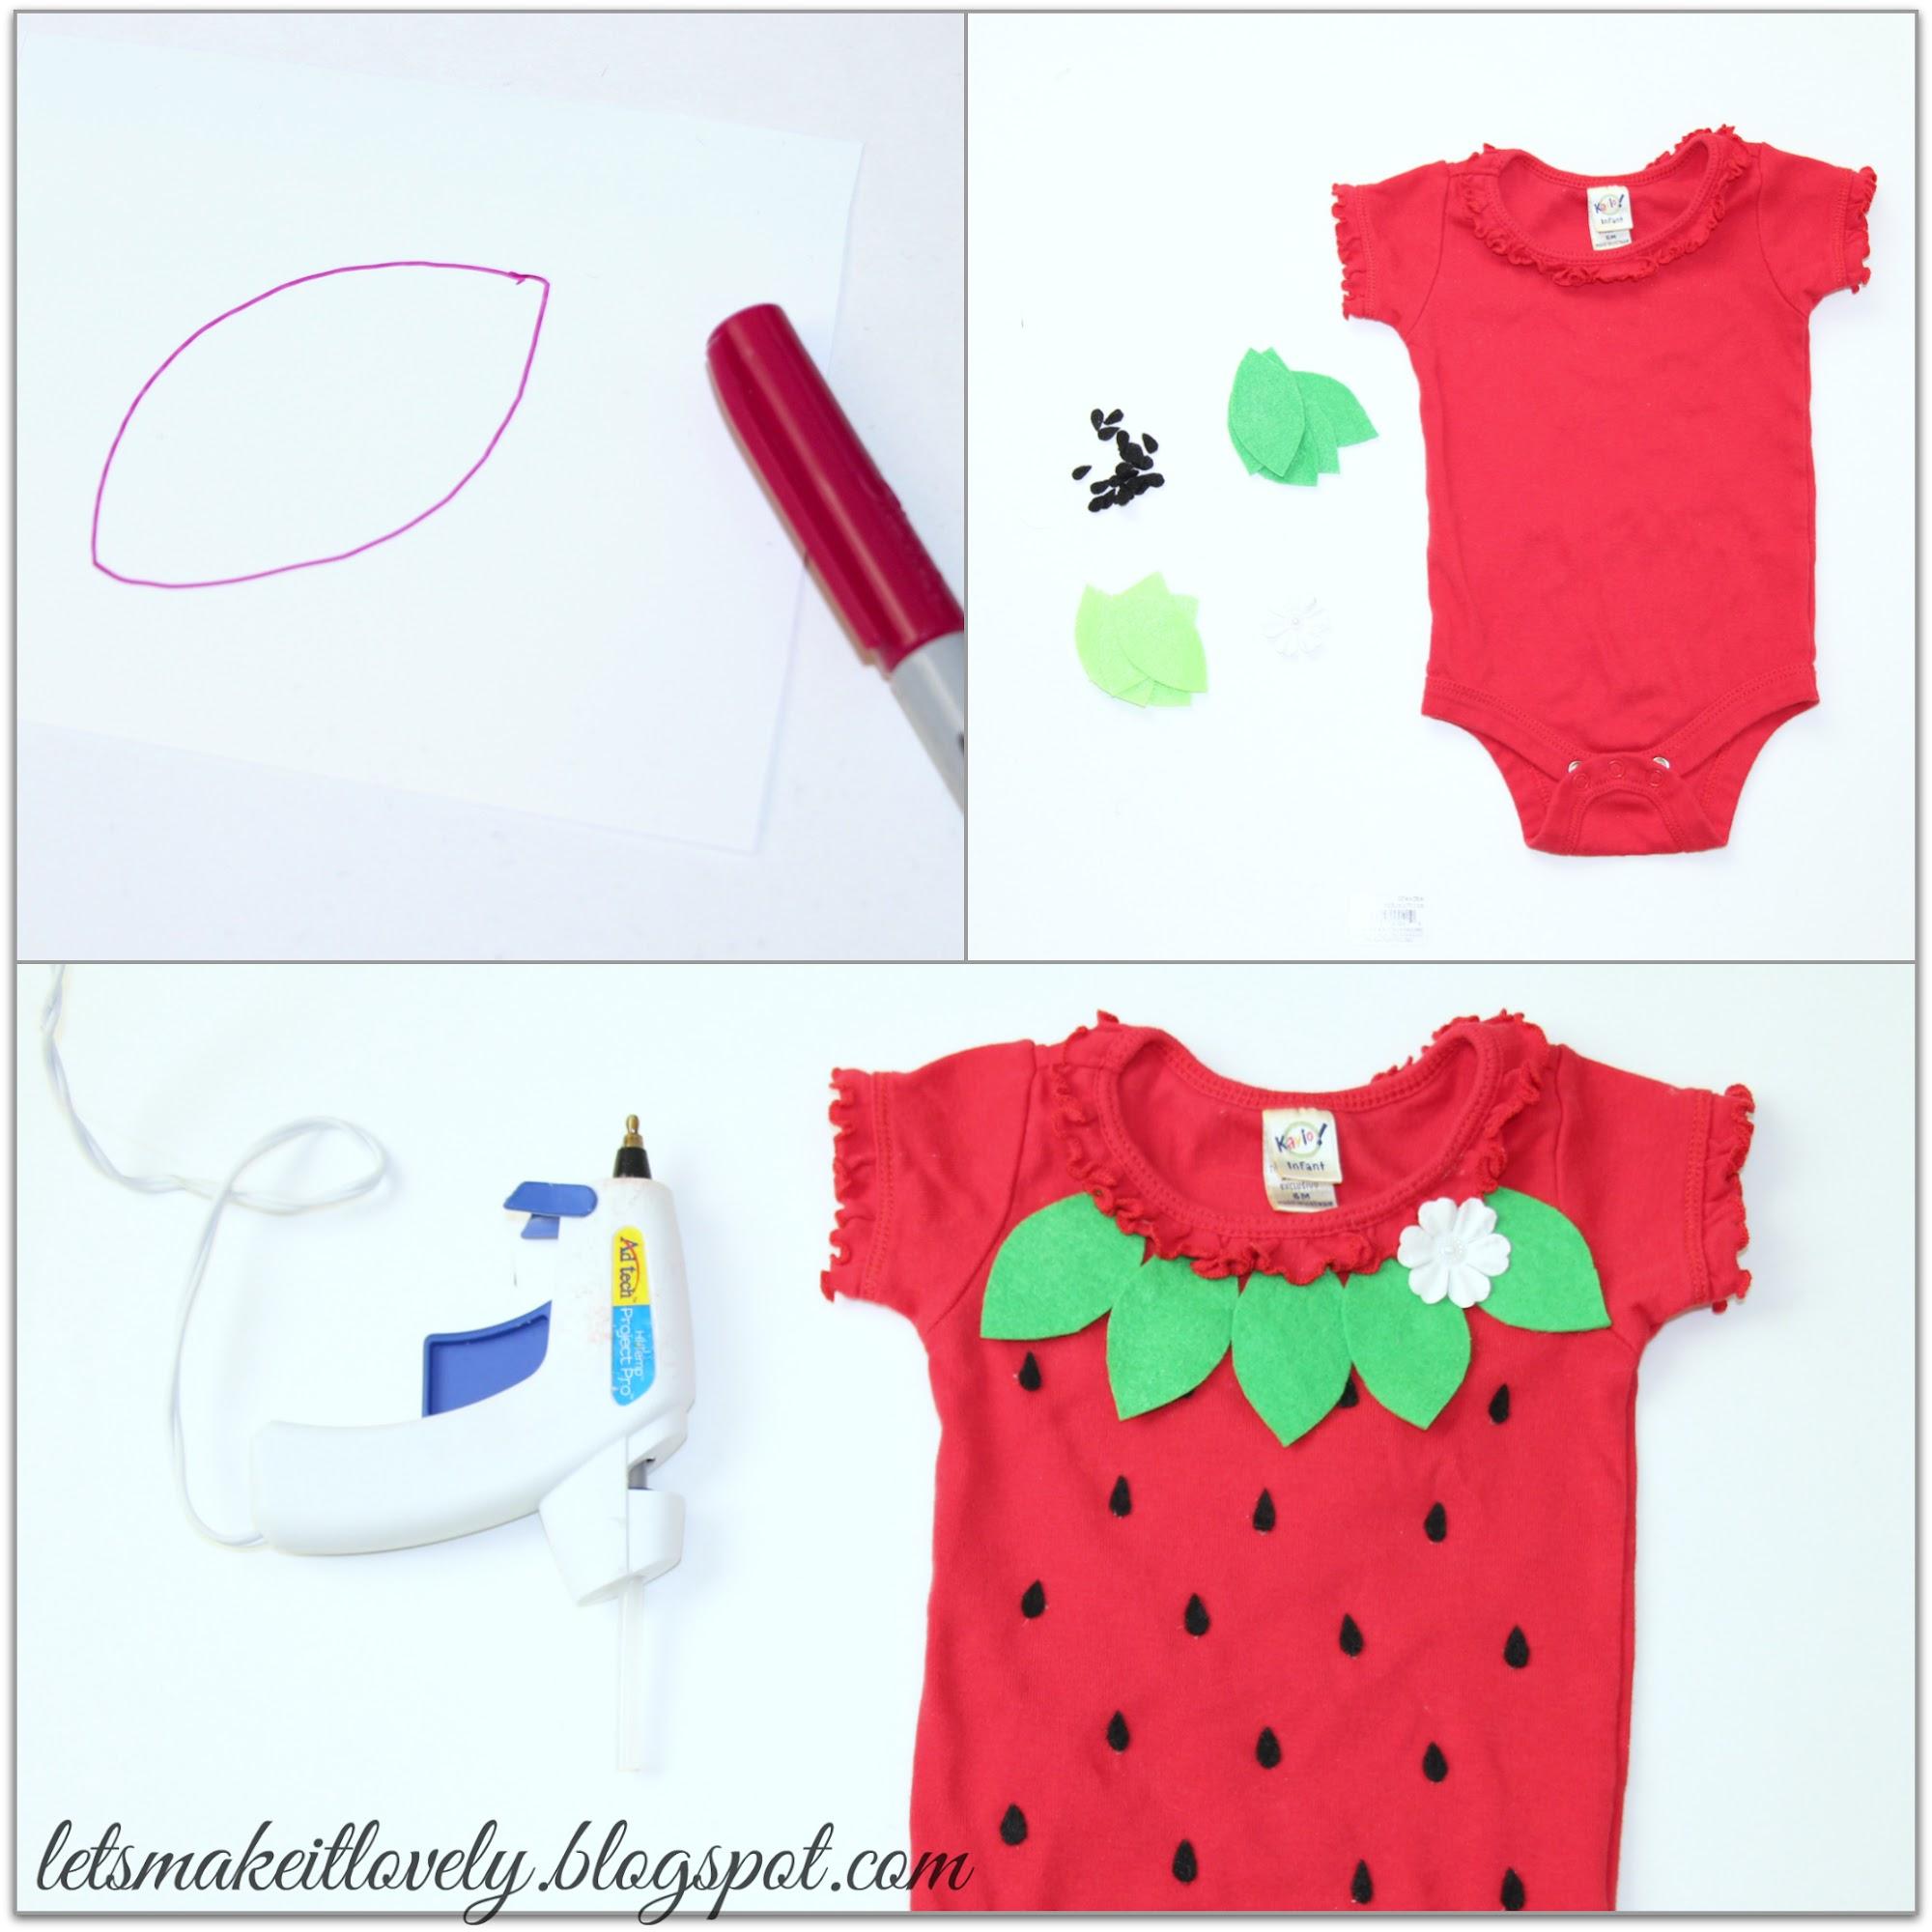 DIY Baby Strawberry Costume, DIY Simple Halloween Costume for Infant, Easy Handmade Costume